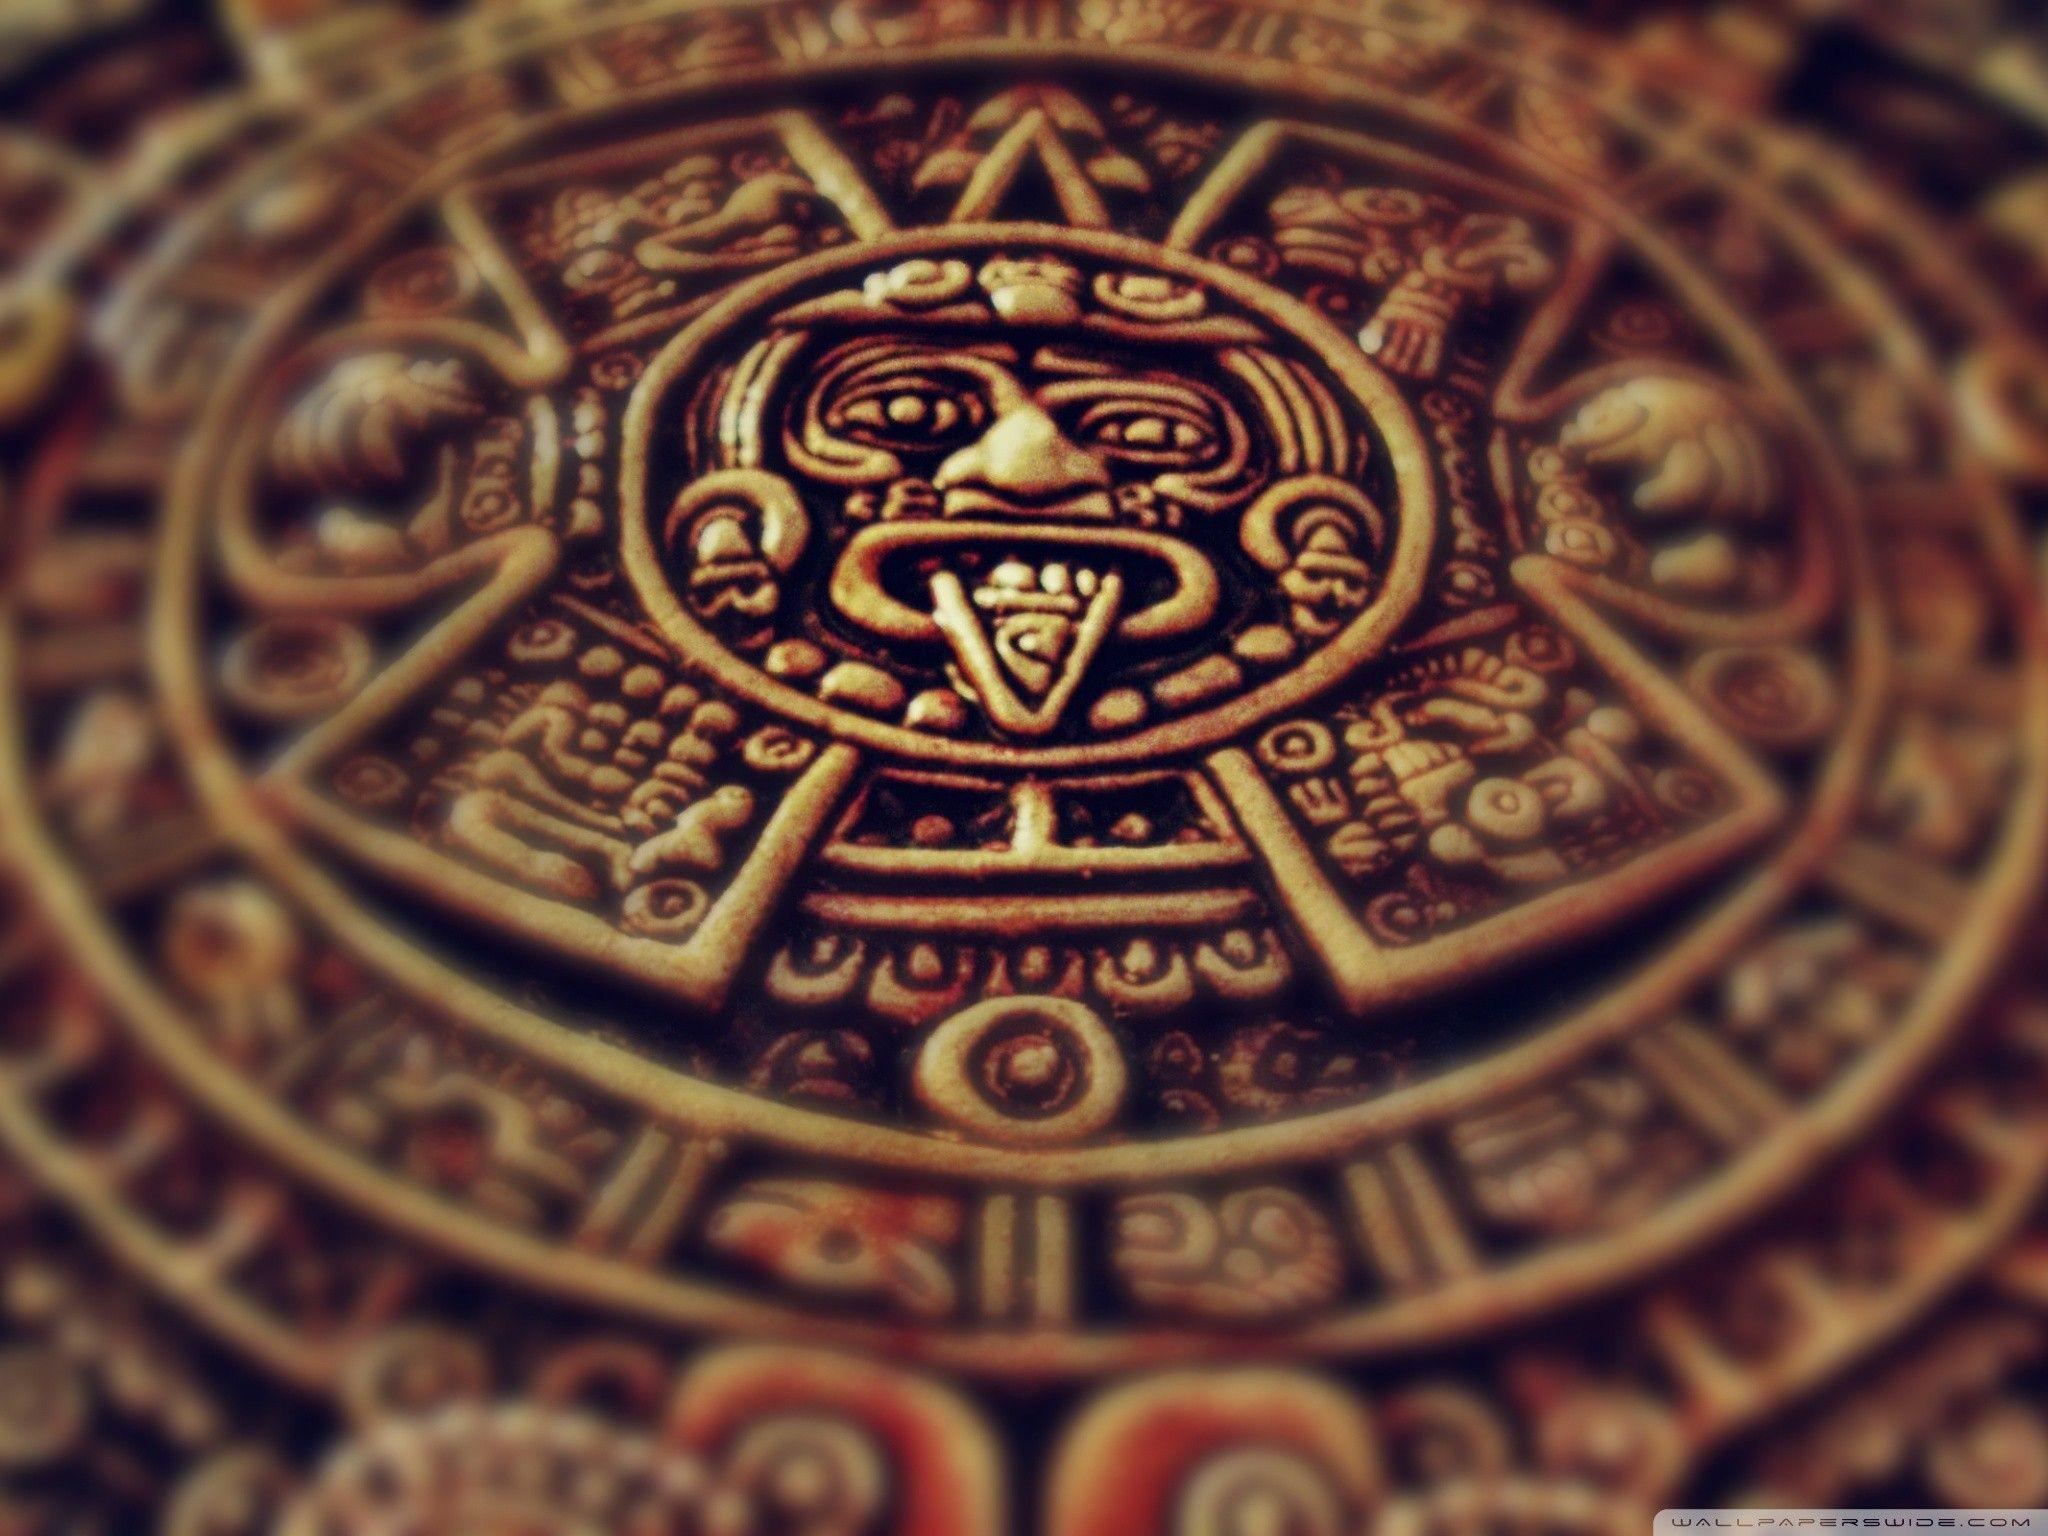 Aztec Calendar Wallpapers 2048x1536